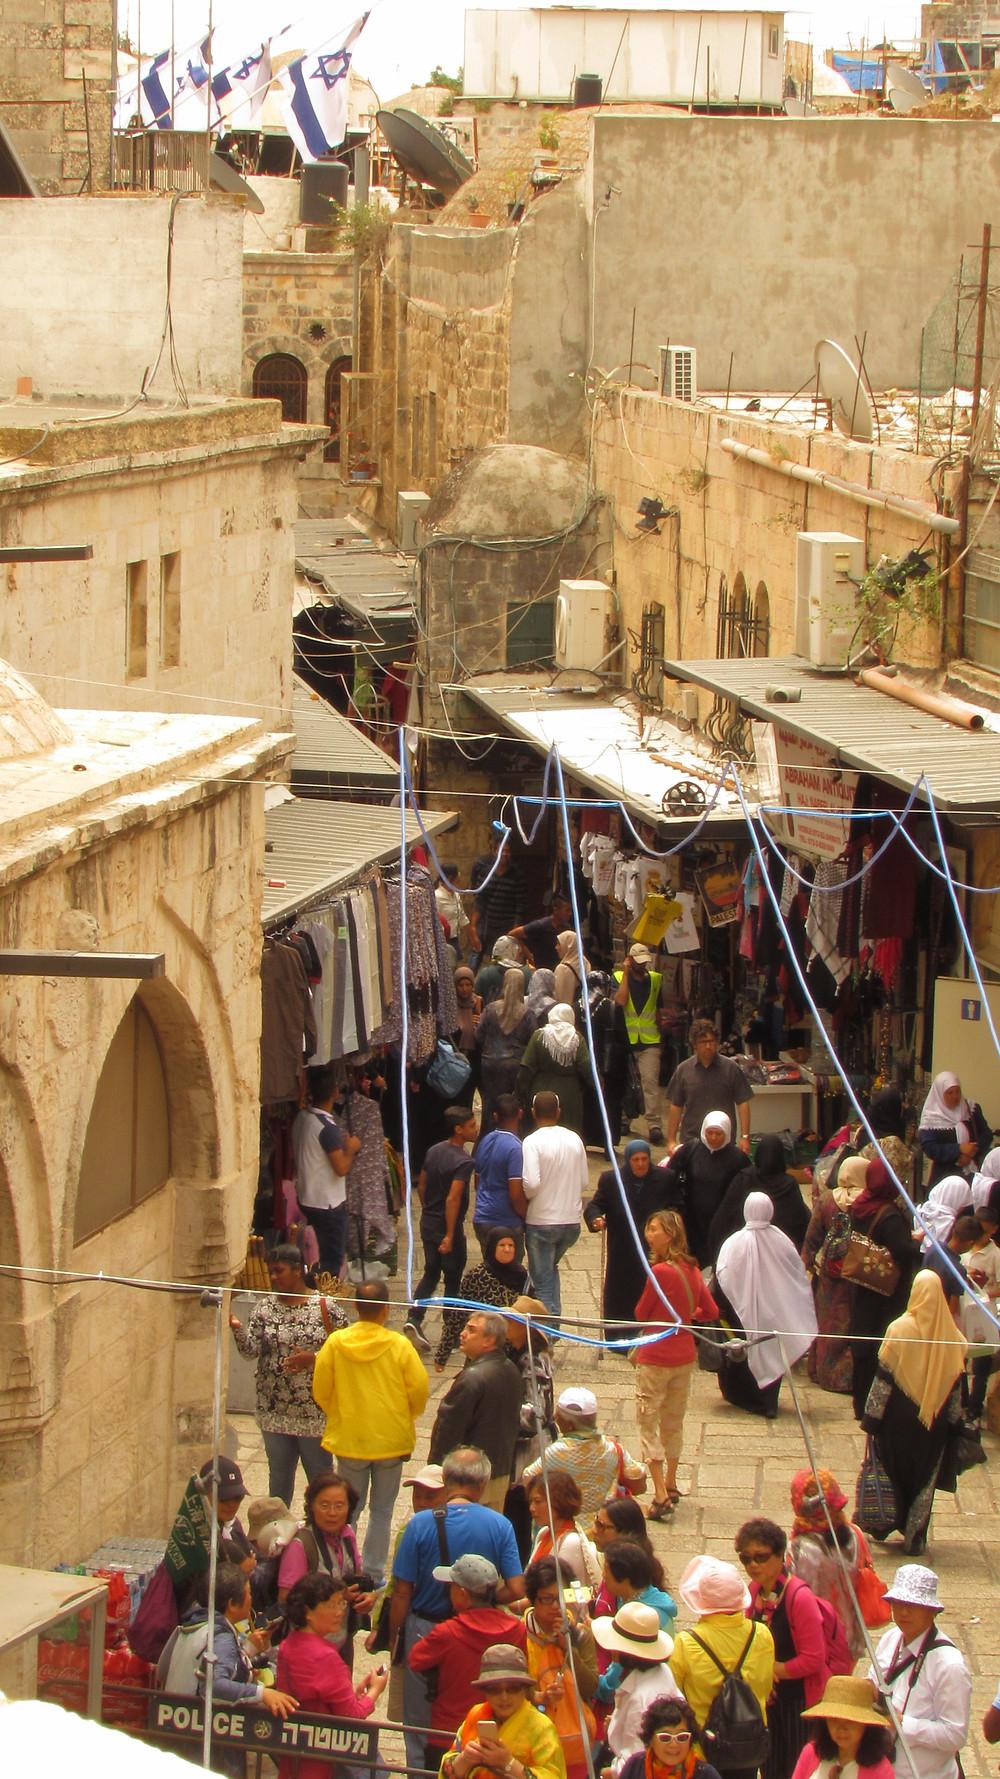 Jews, Christians, Moslems in the Via Dolorosa